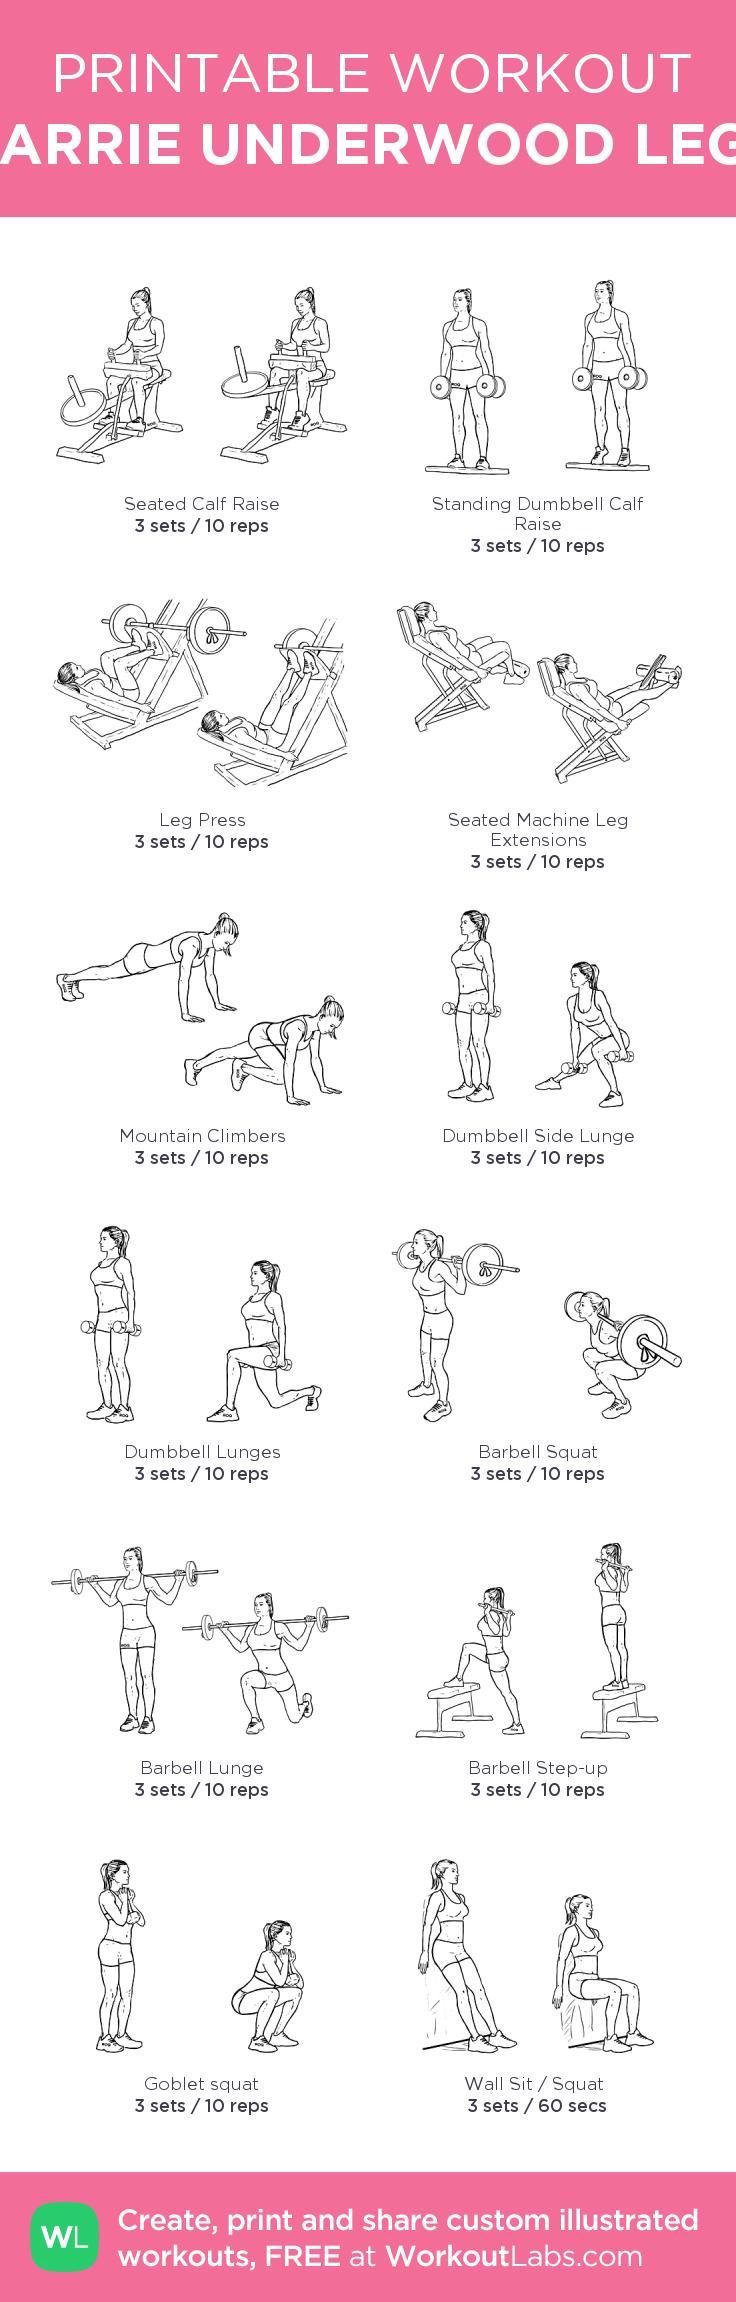 CARRIE UNDERWOOD LEGS · WorkoutLabs Fit